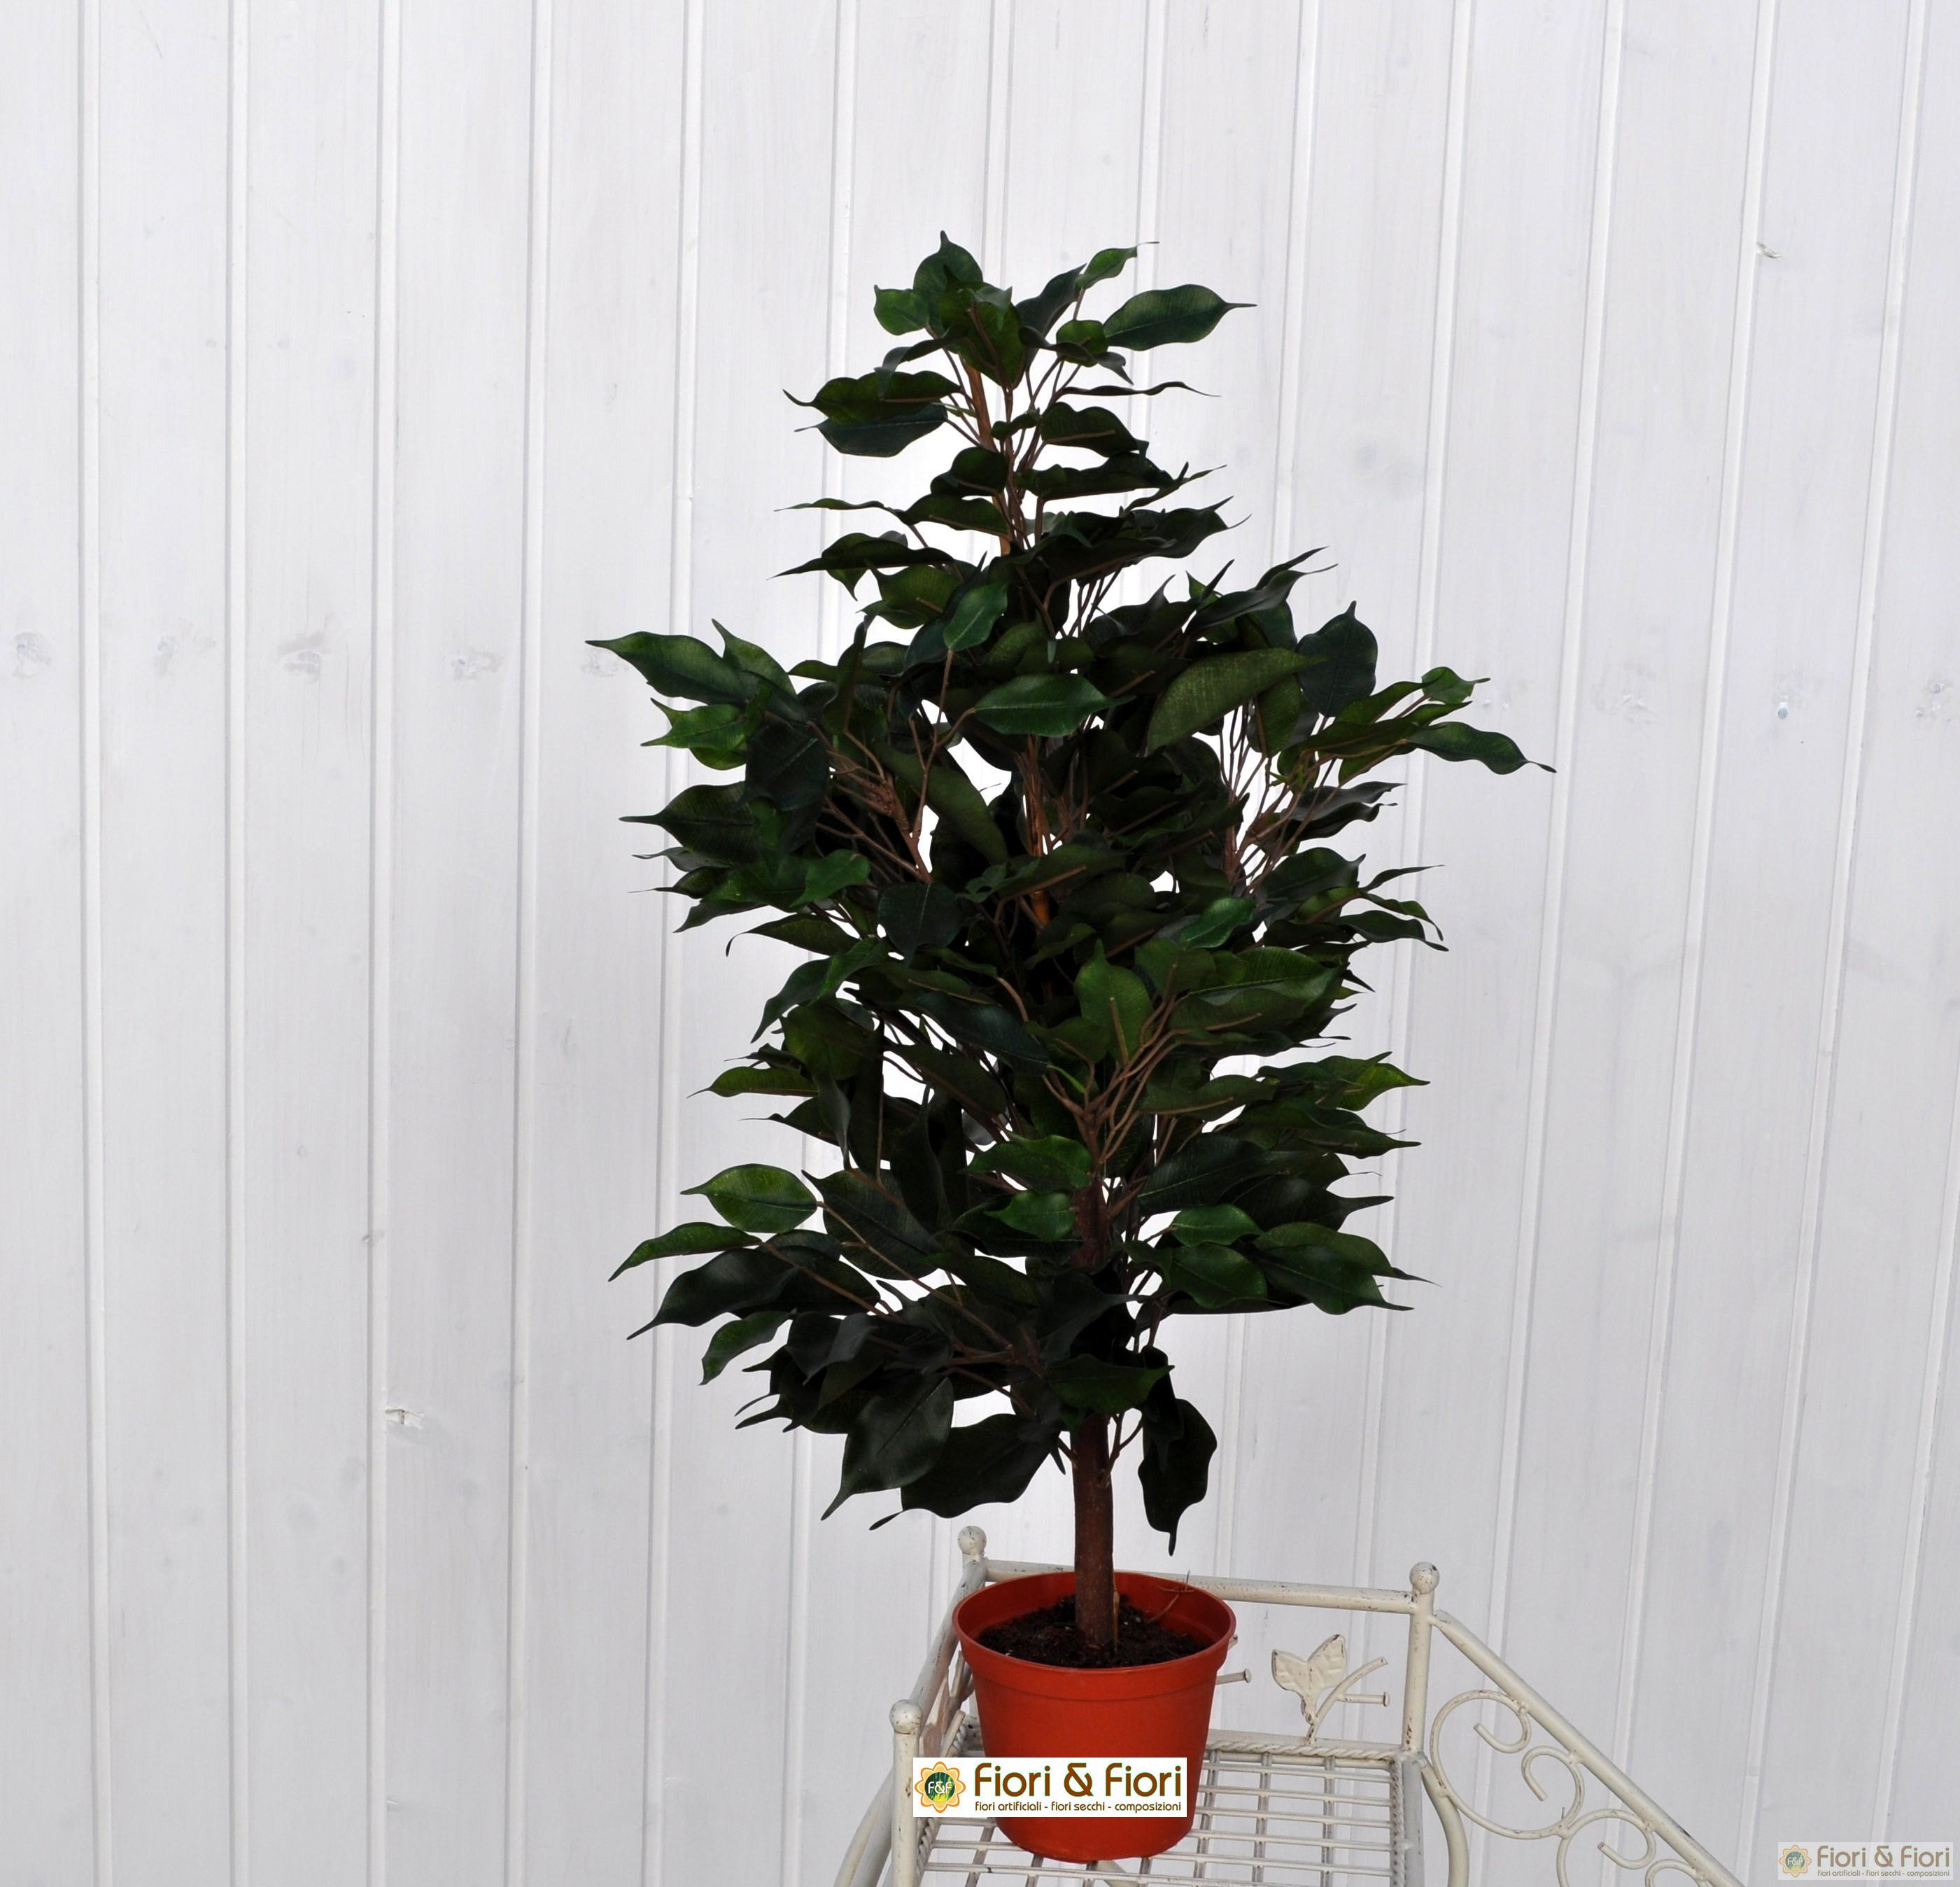 Come Riprodurre Il Ficus Benjamin ficus benjamin artificiale verde